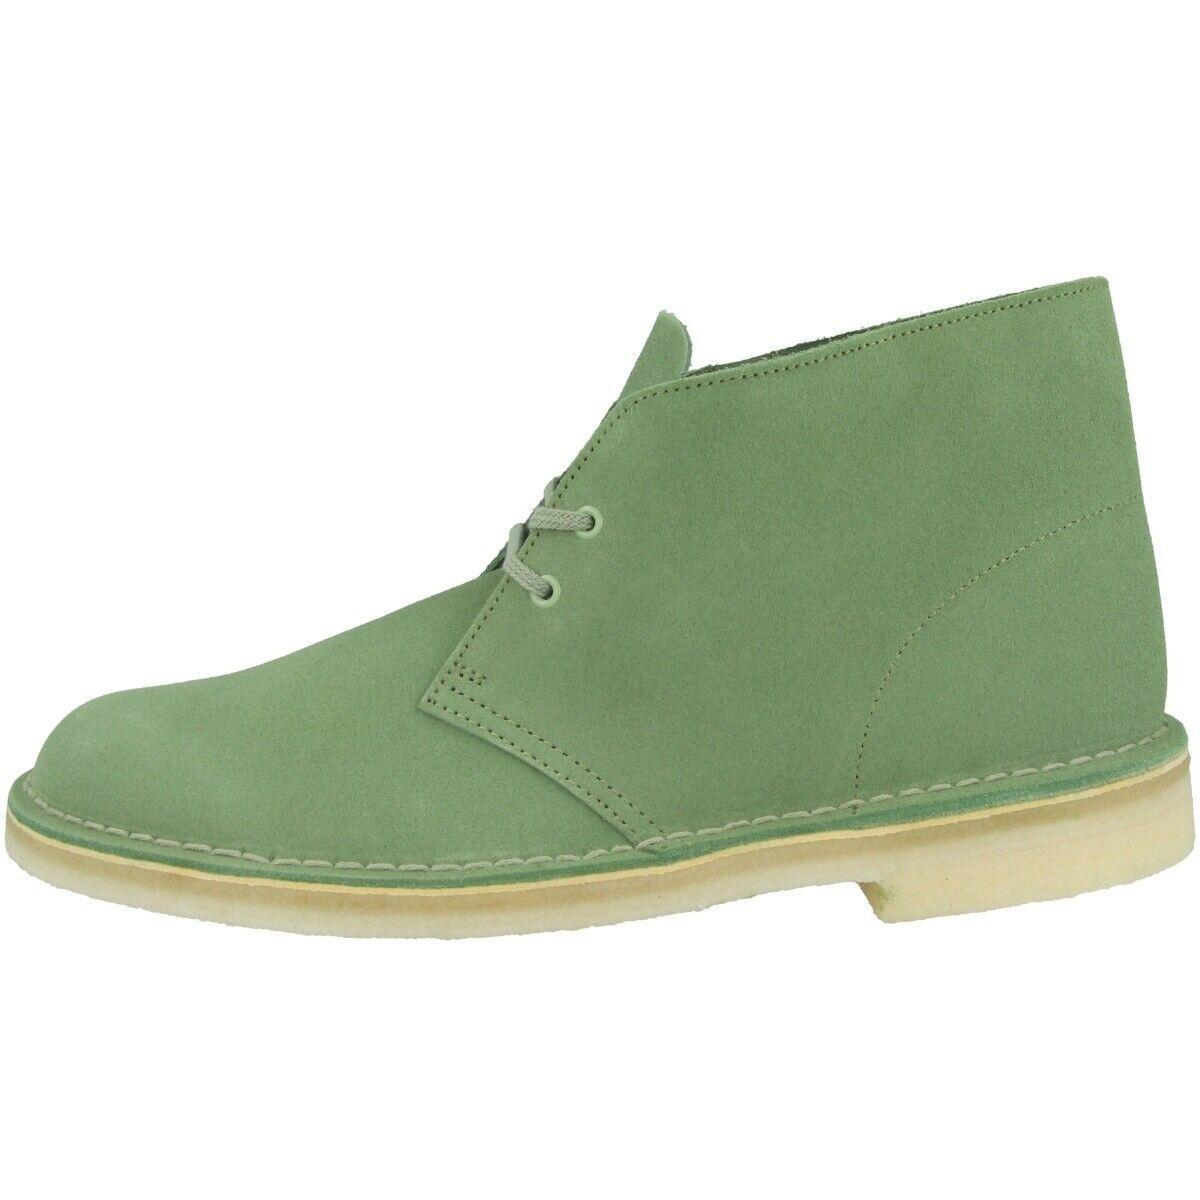 Clarks Desert Boot men shoes Stivali con Lacci Green Suede 26141960